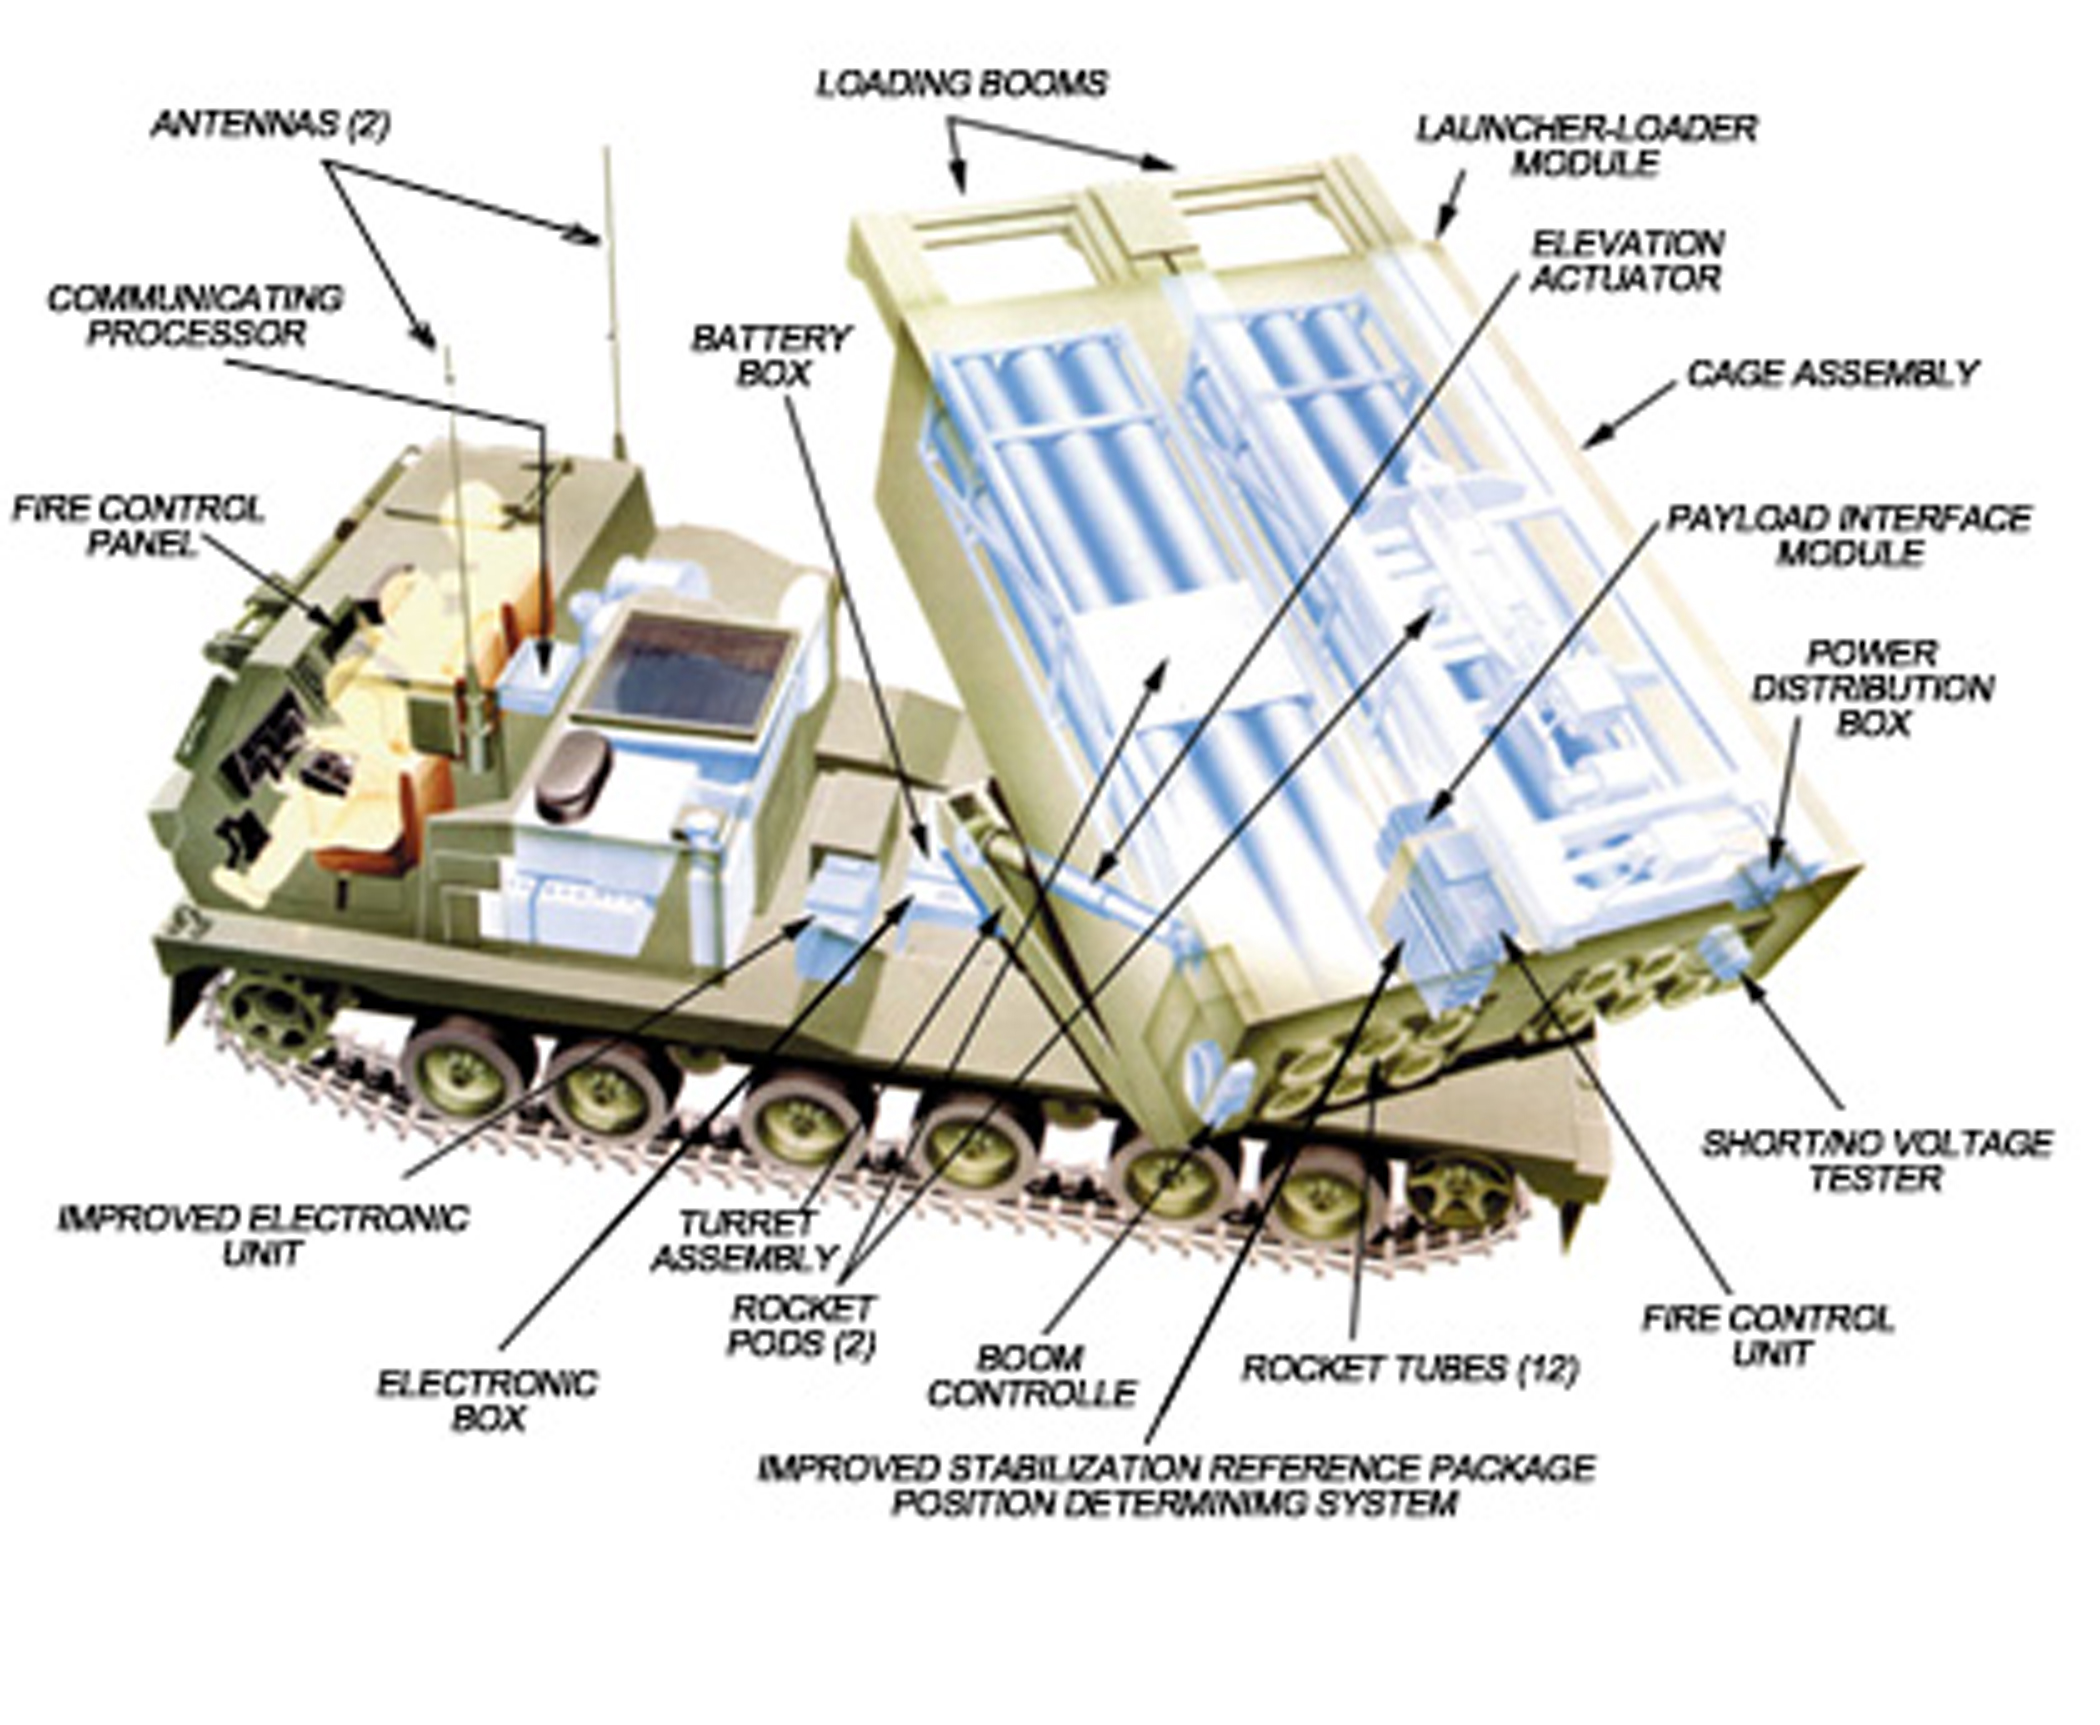 desert hawk diagram 2000 vw jetta radio wiring multiple launch rocket system 227 mm mlrs  the